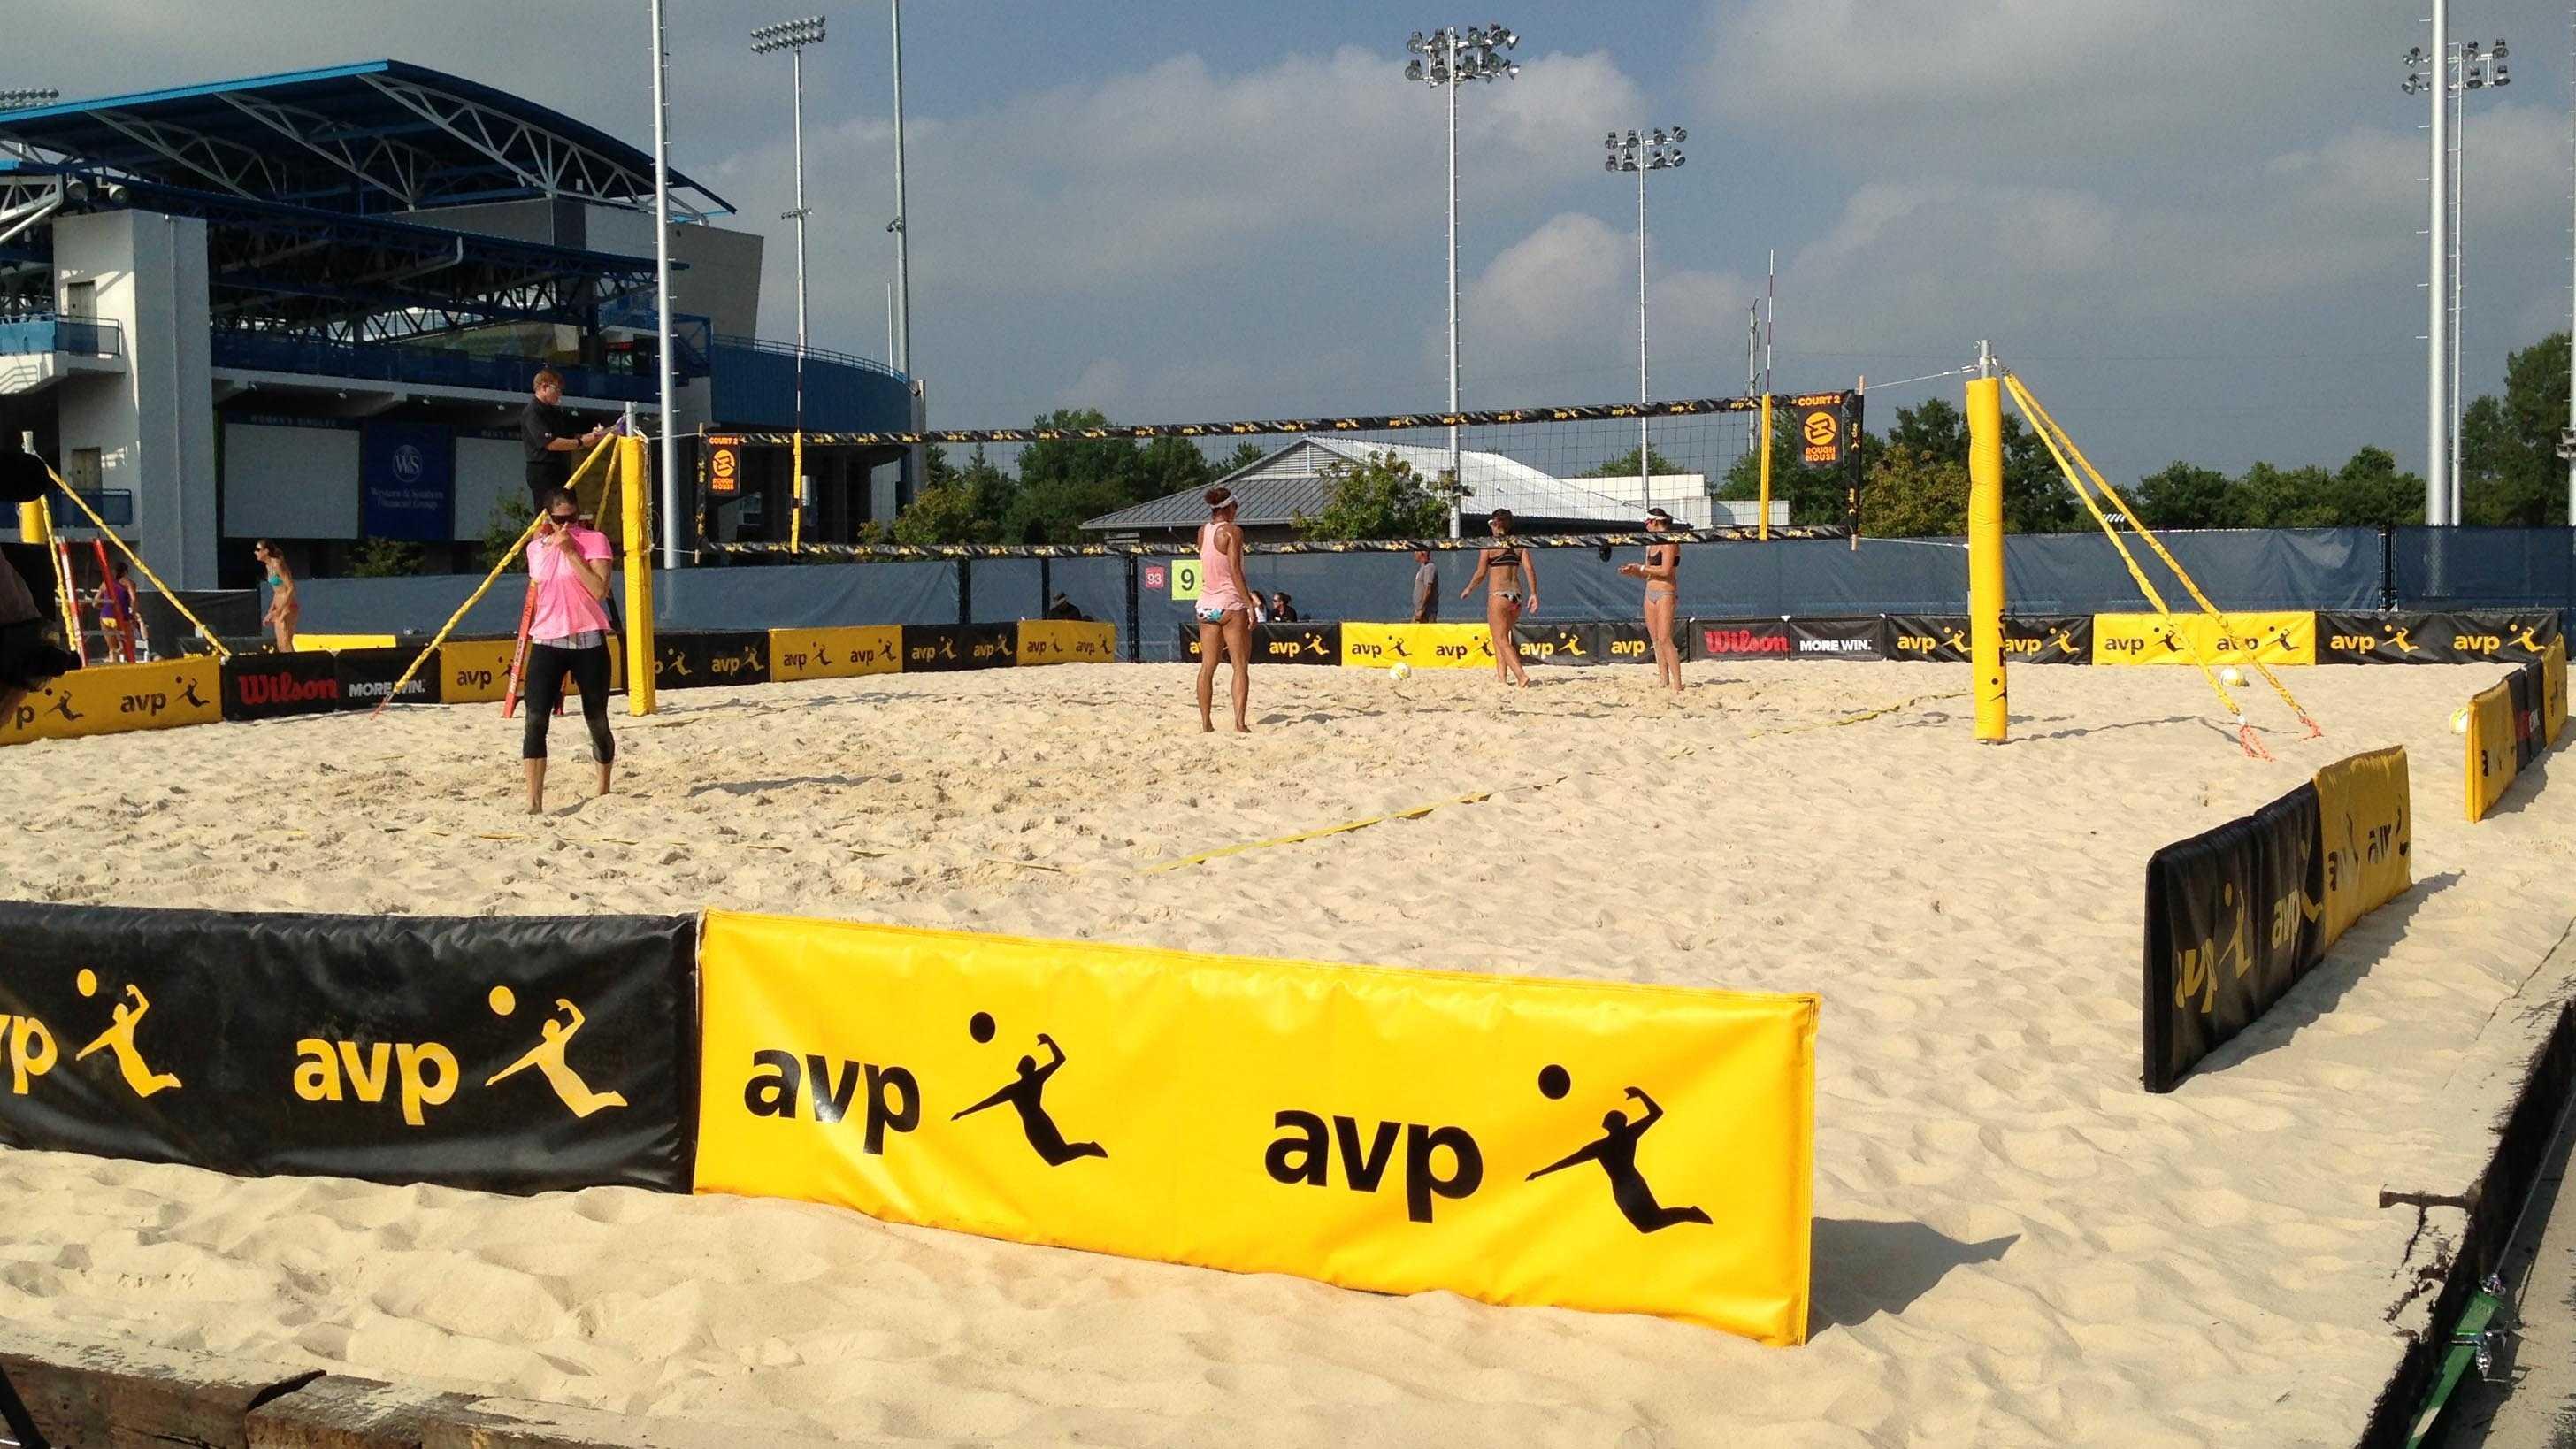 AVP volleyball generic 2013.jpg